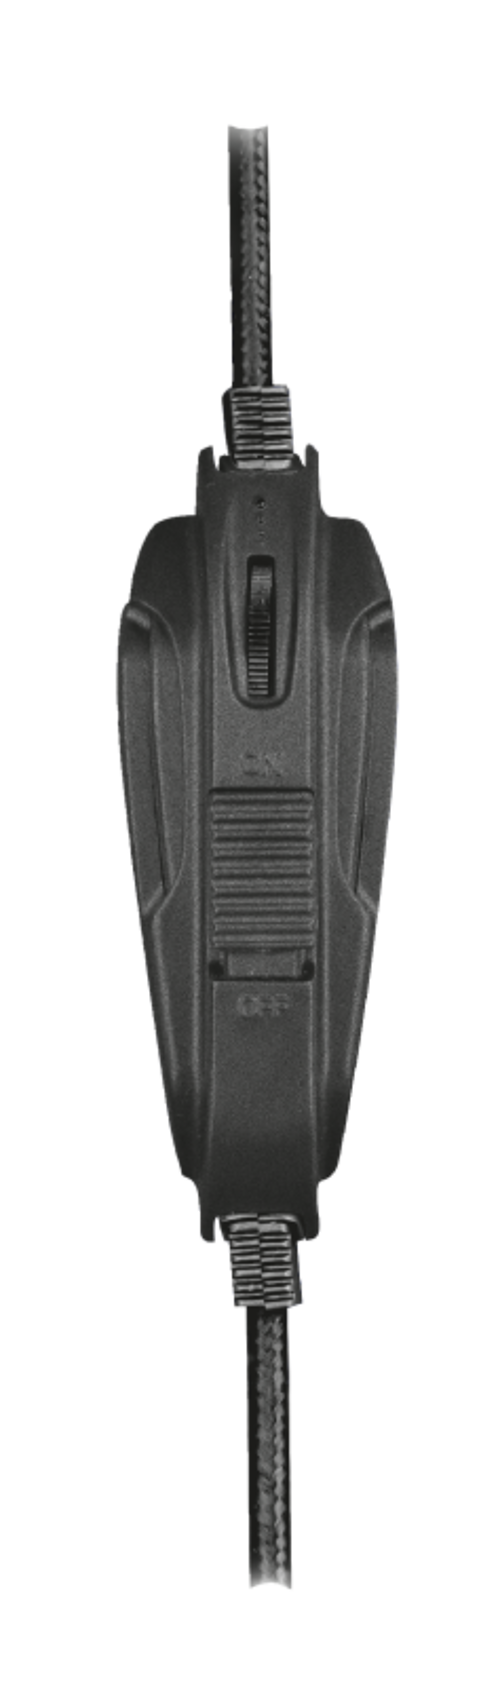 CASQUE + MICRO GXT-307 RAVU PS/4 tr232503